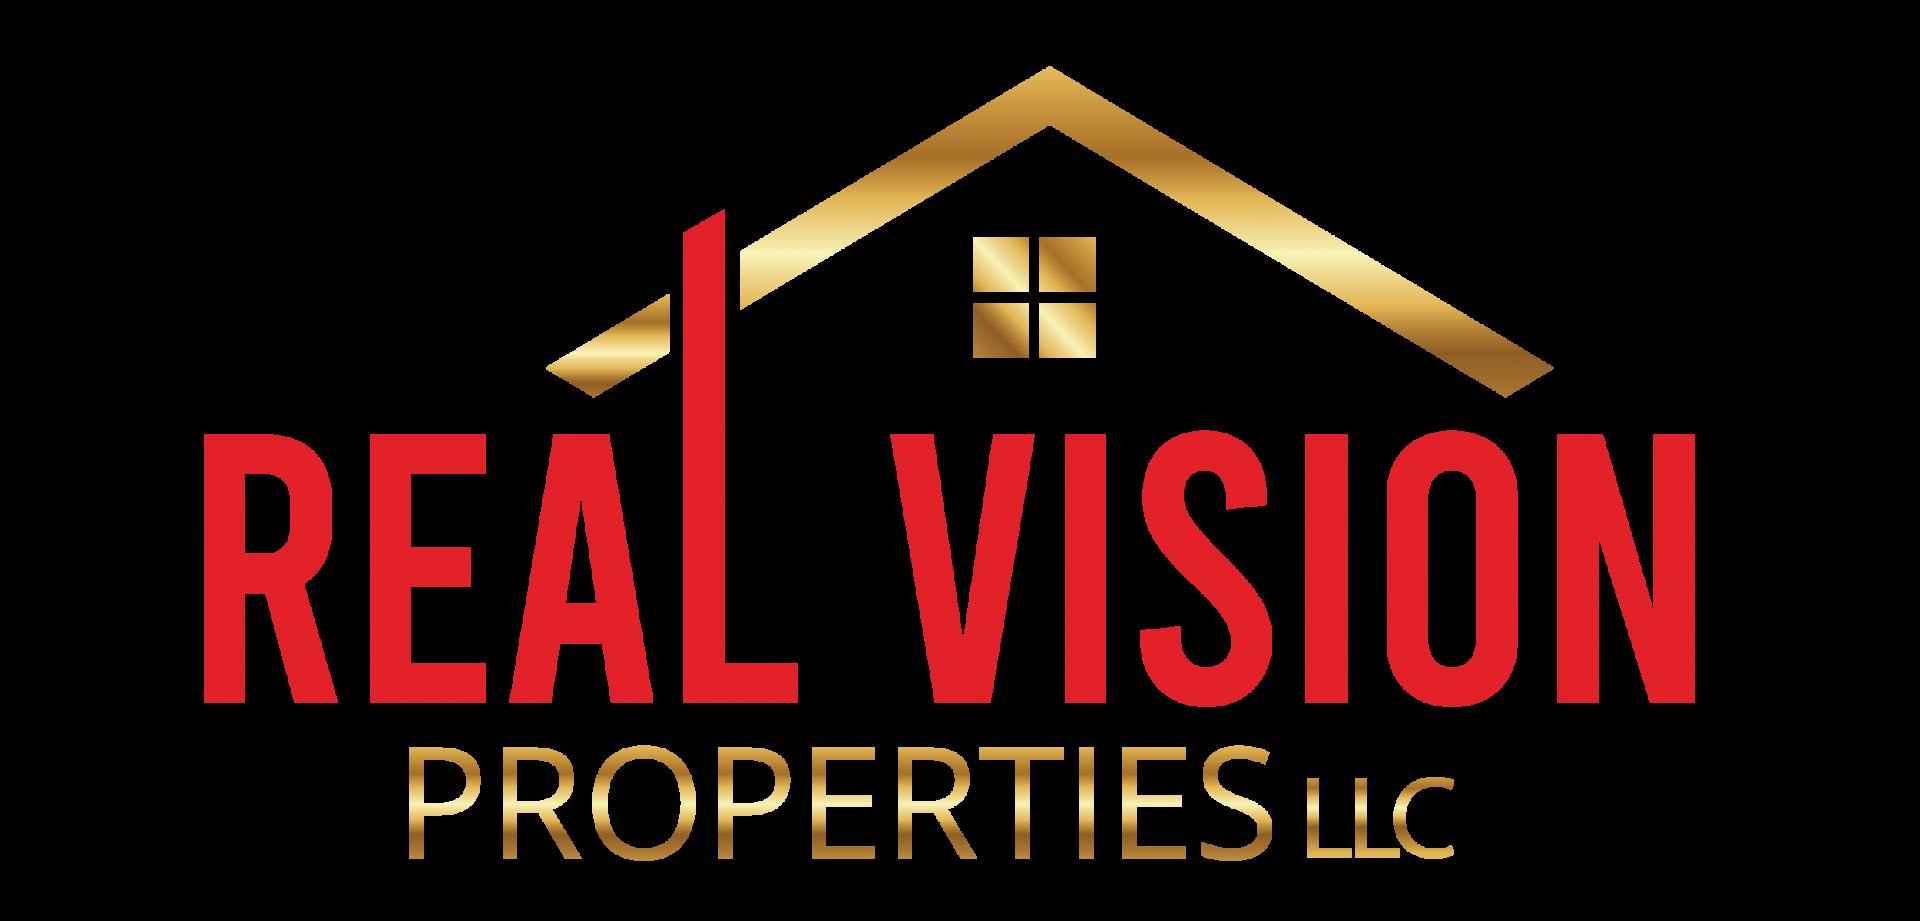 Real Vision Properties LLC logo